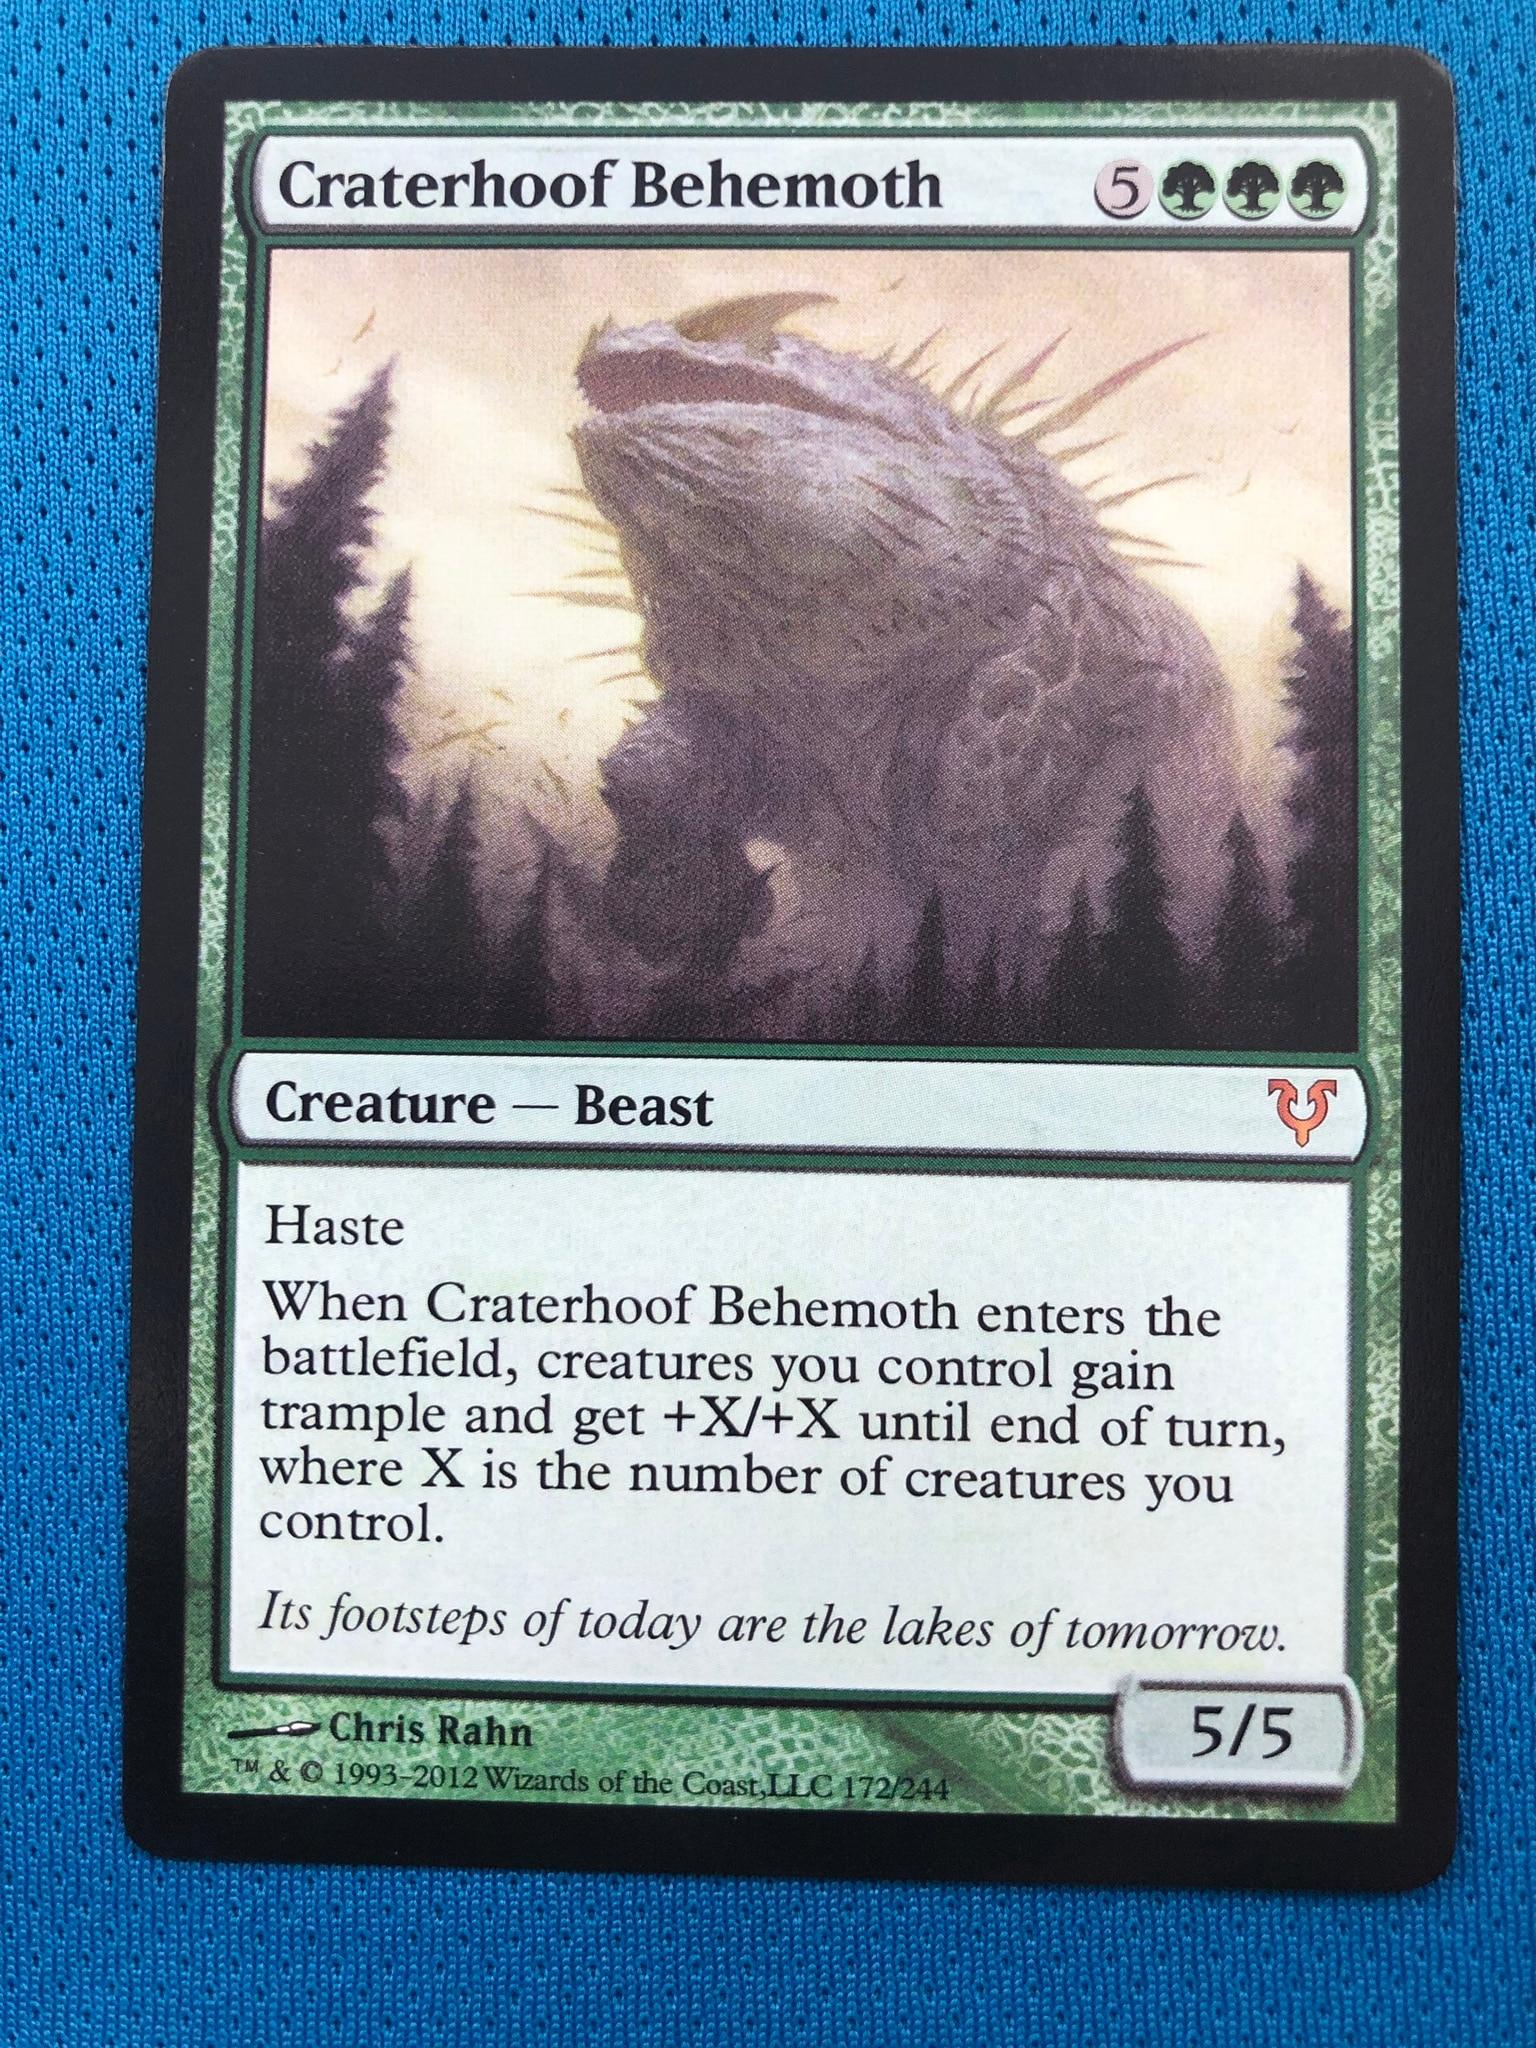 Craterhoof BehemothAvacyn Restored Magician ProxyKing 8.0 VIP The Proxy Cards To Gathering Every Single Mg Card.